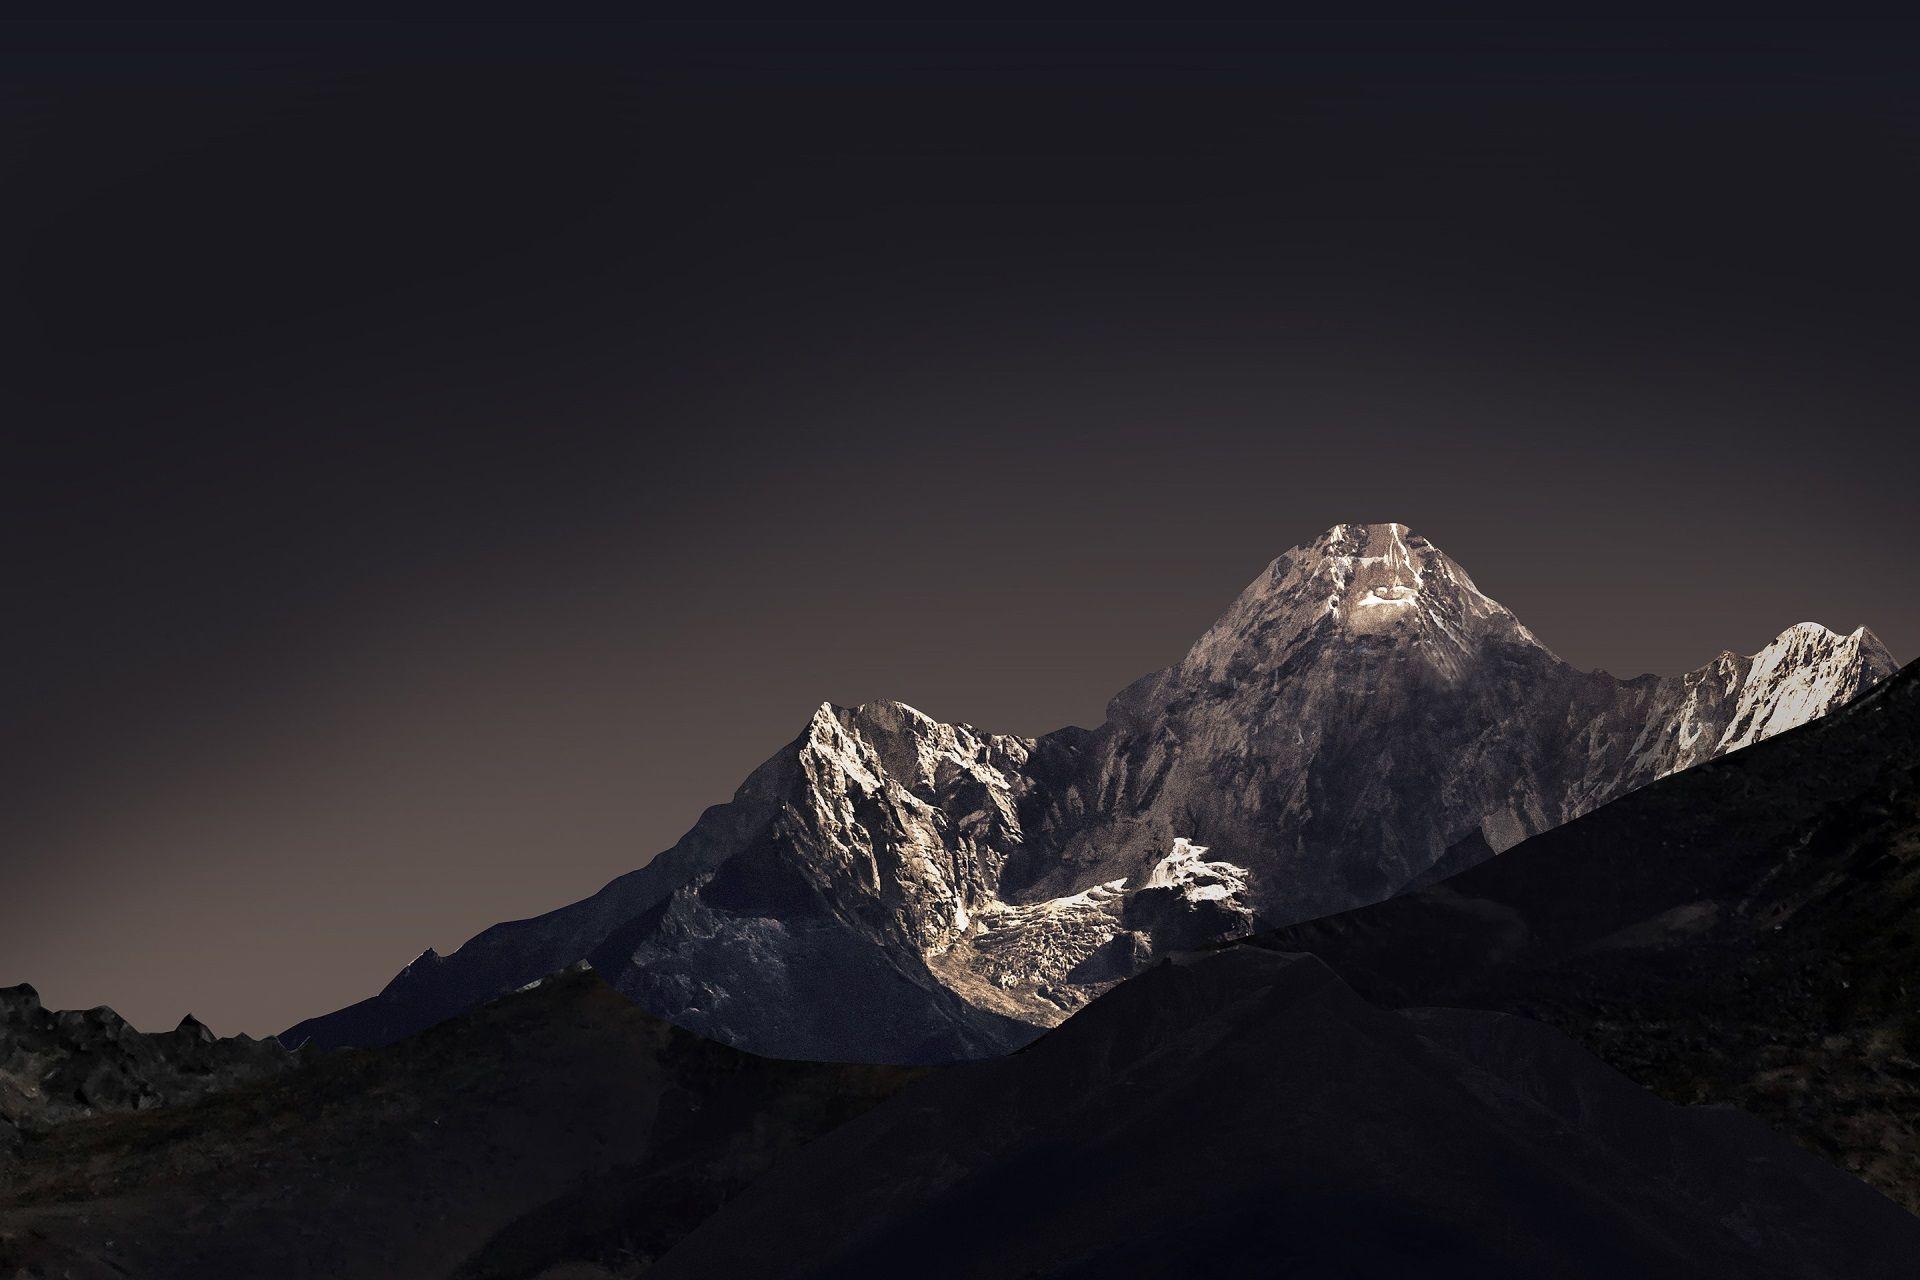 1920x1280 Mountains Cool Wallpaper For Desktop Dark Mountains Mountain Pictures Hd Nature Wallpapers